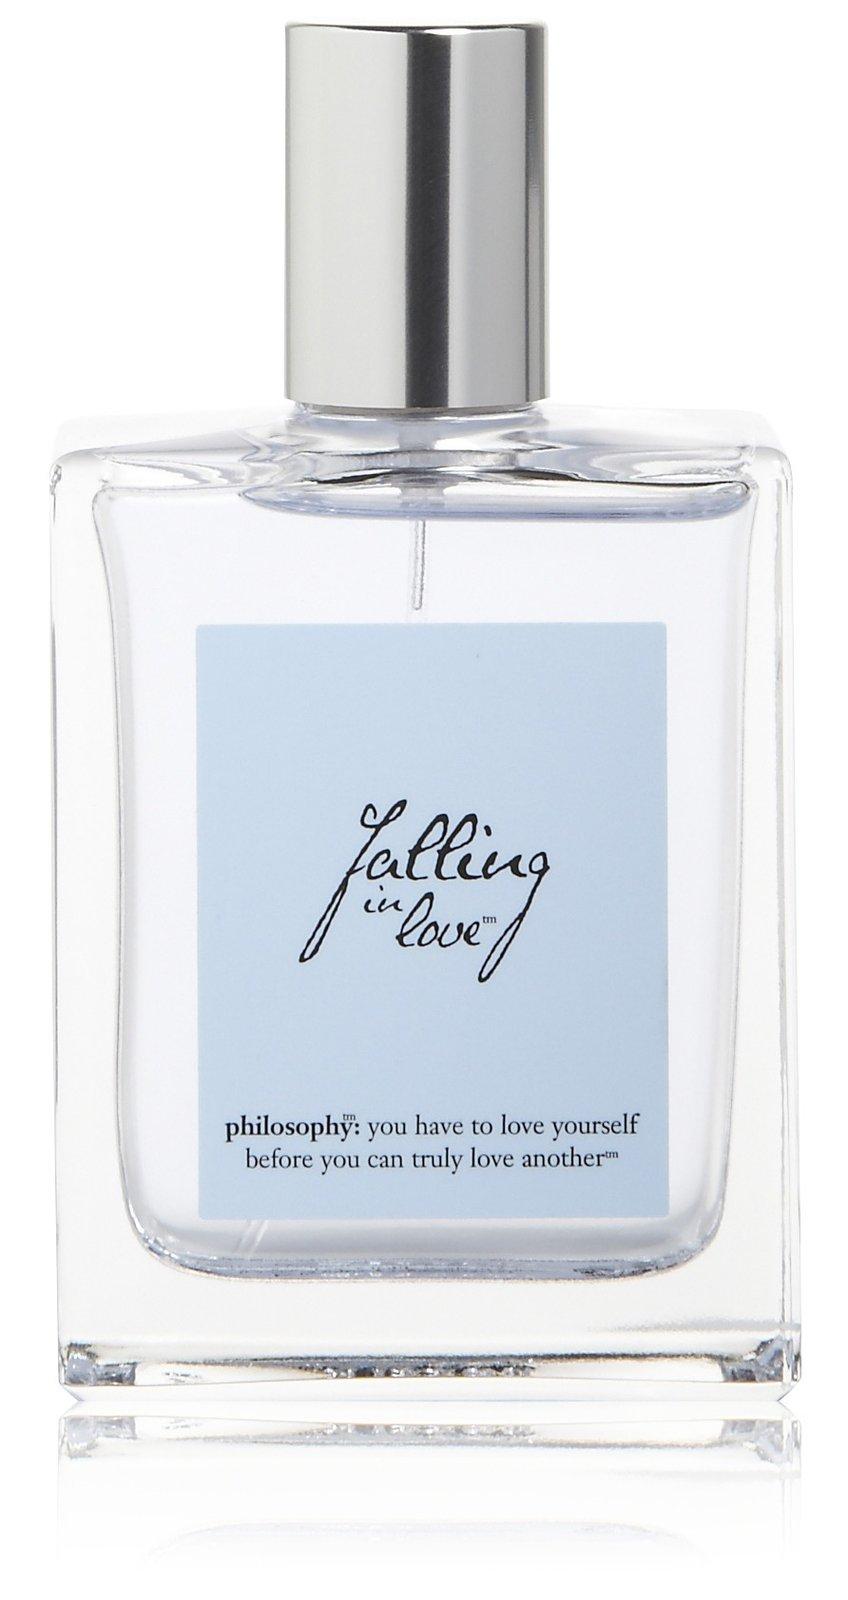 philosophy falling in love spray fragrance